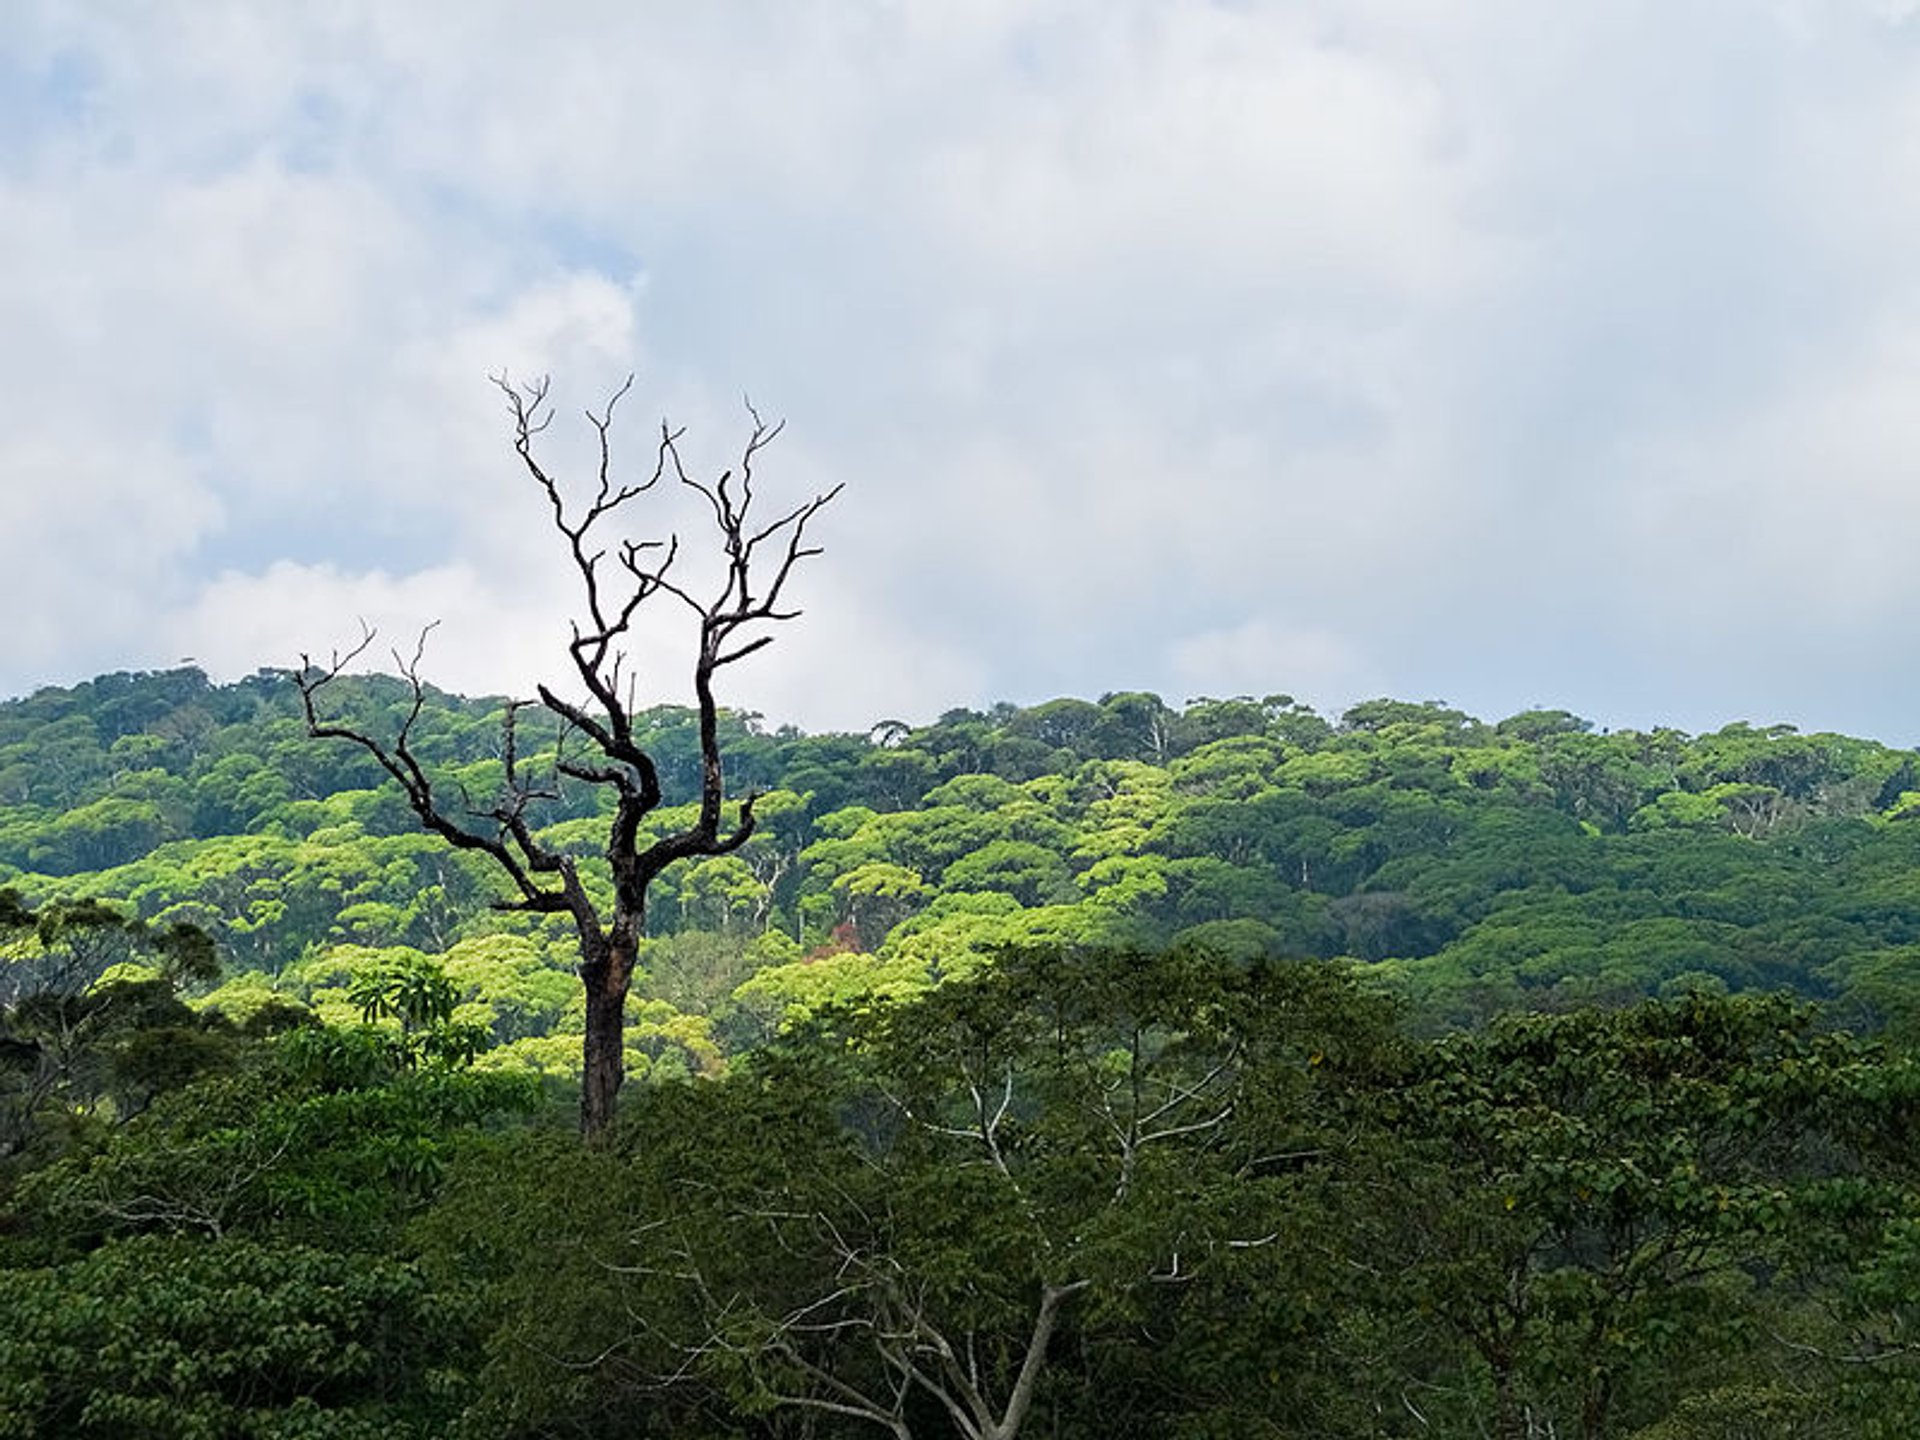 Sinharaja Rainforest in Sri Lanka 2020 - Best Time